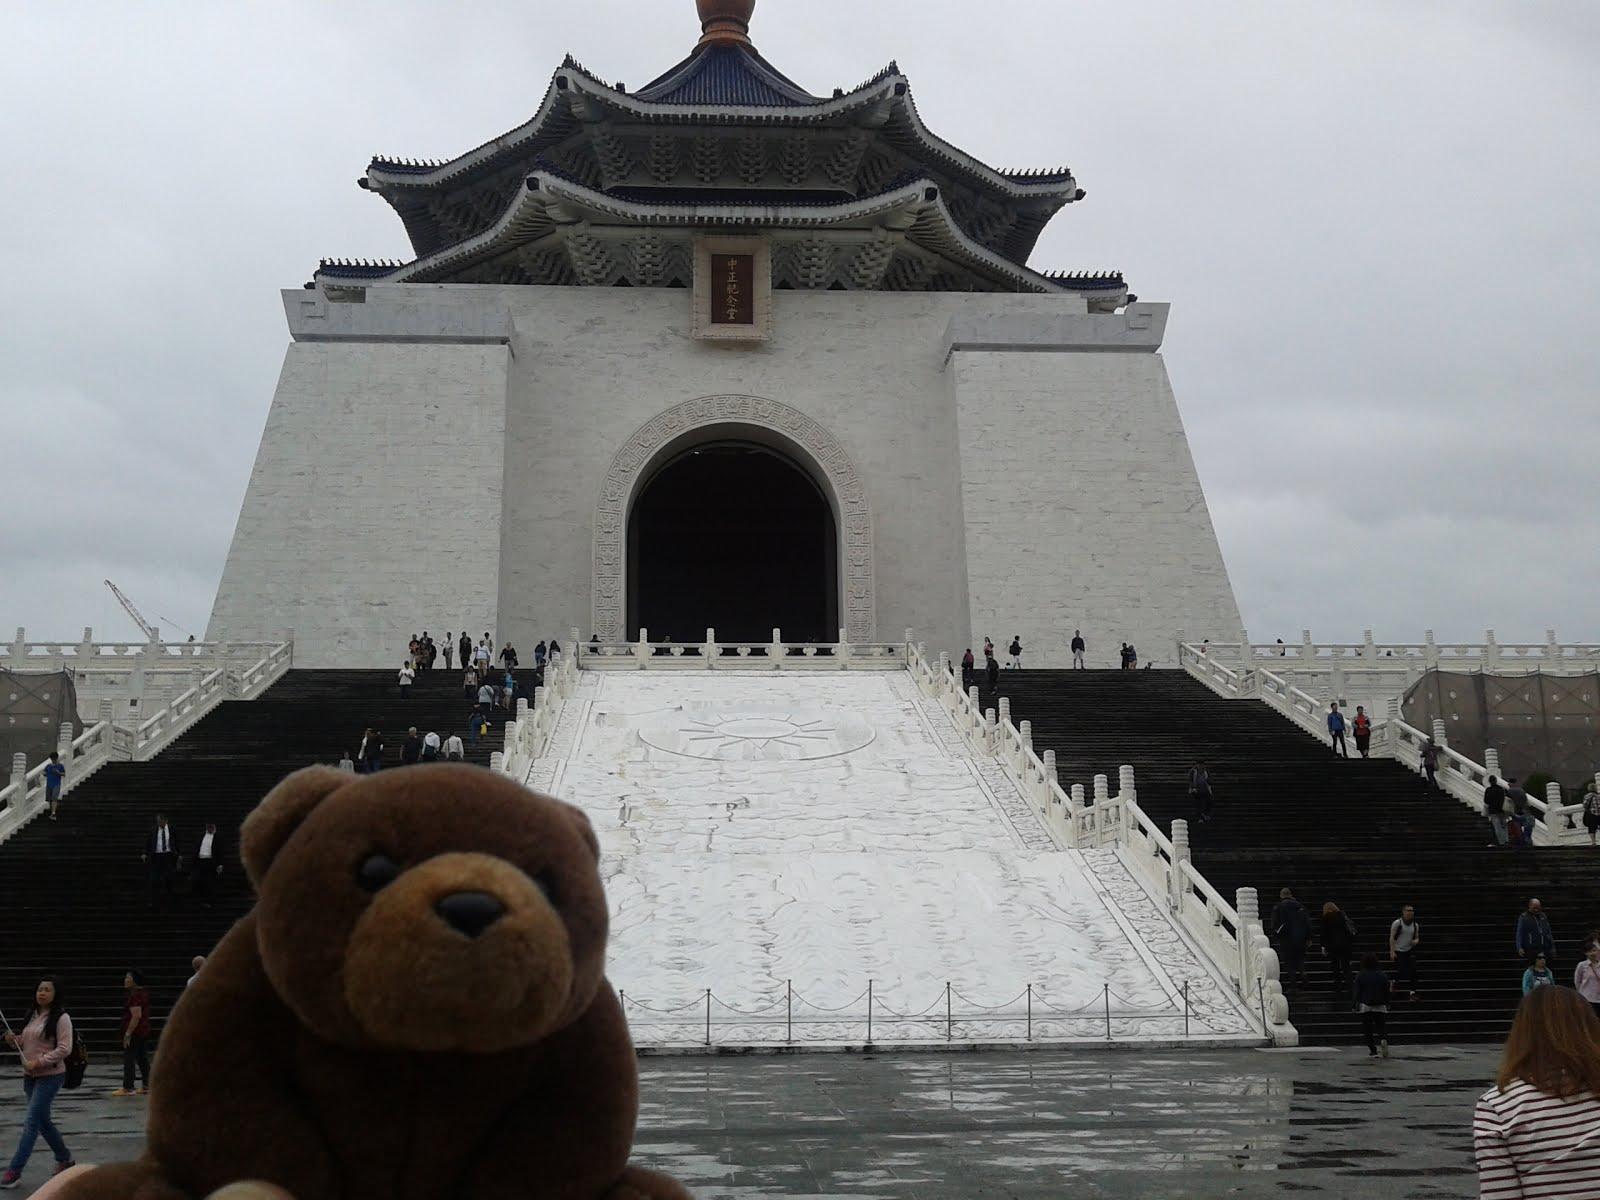 Teddy in front of Chiang Kai-Shek Memorial Hall, Taipei, Taiwan